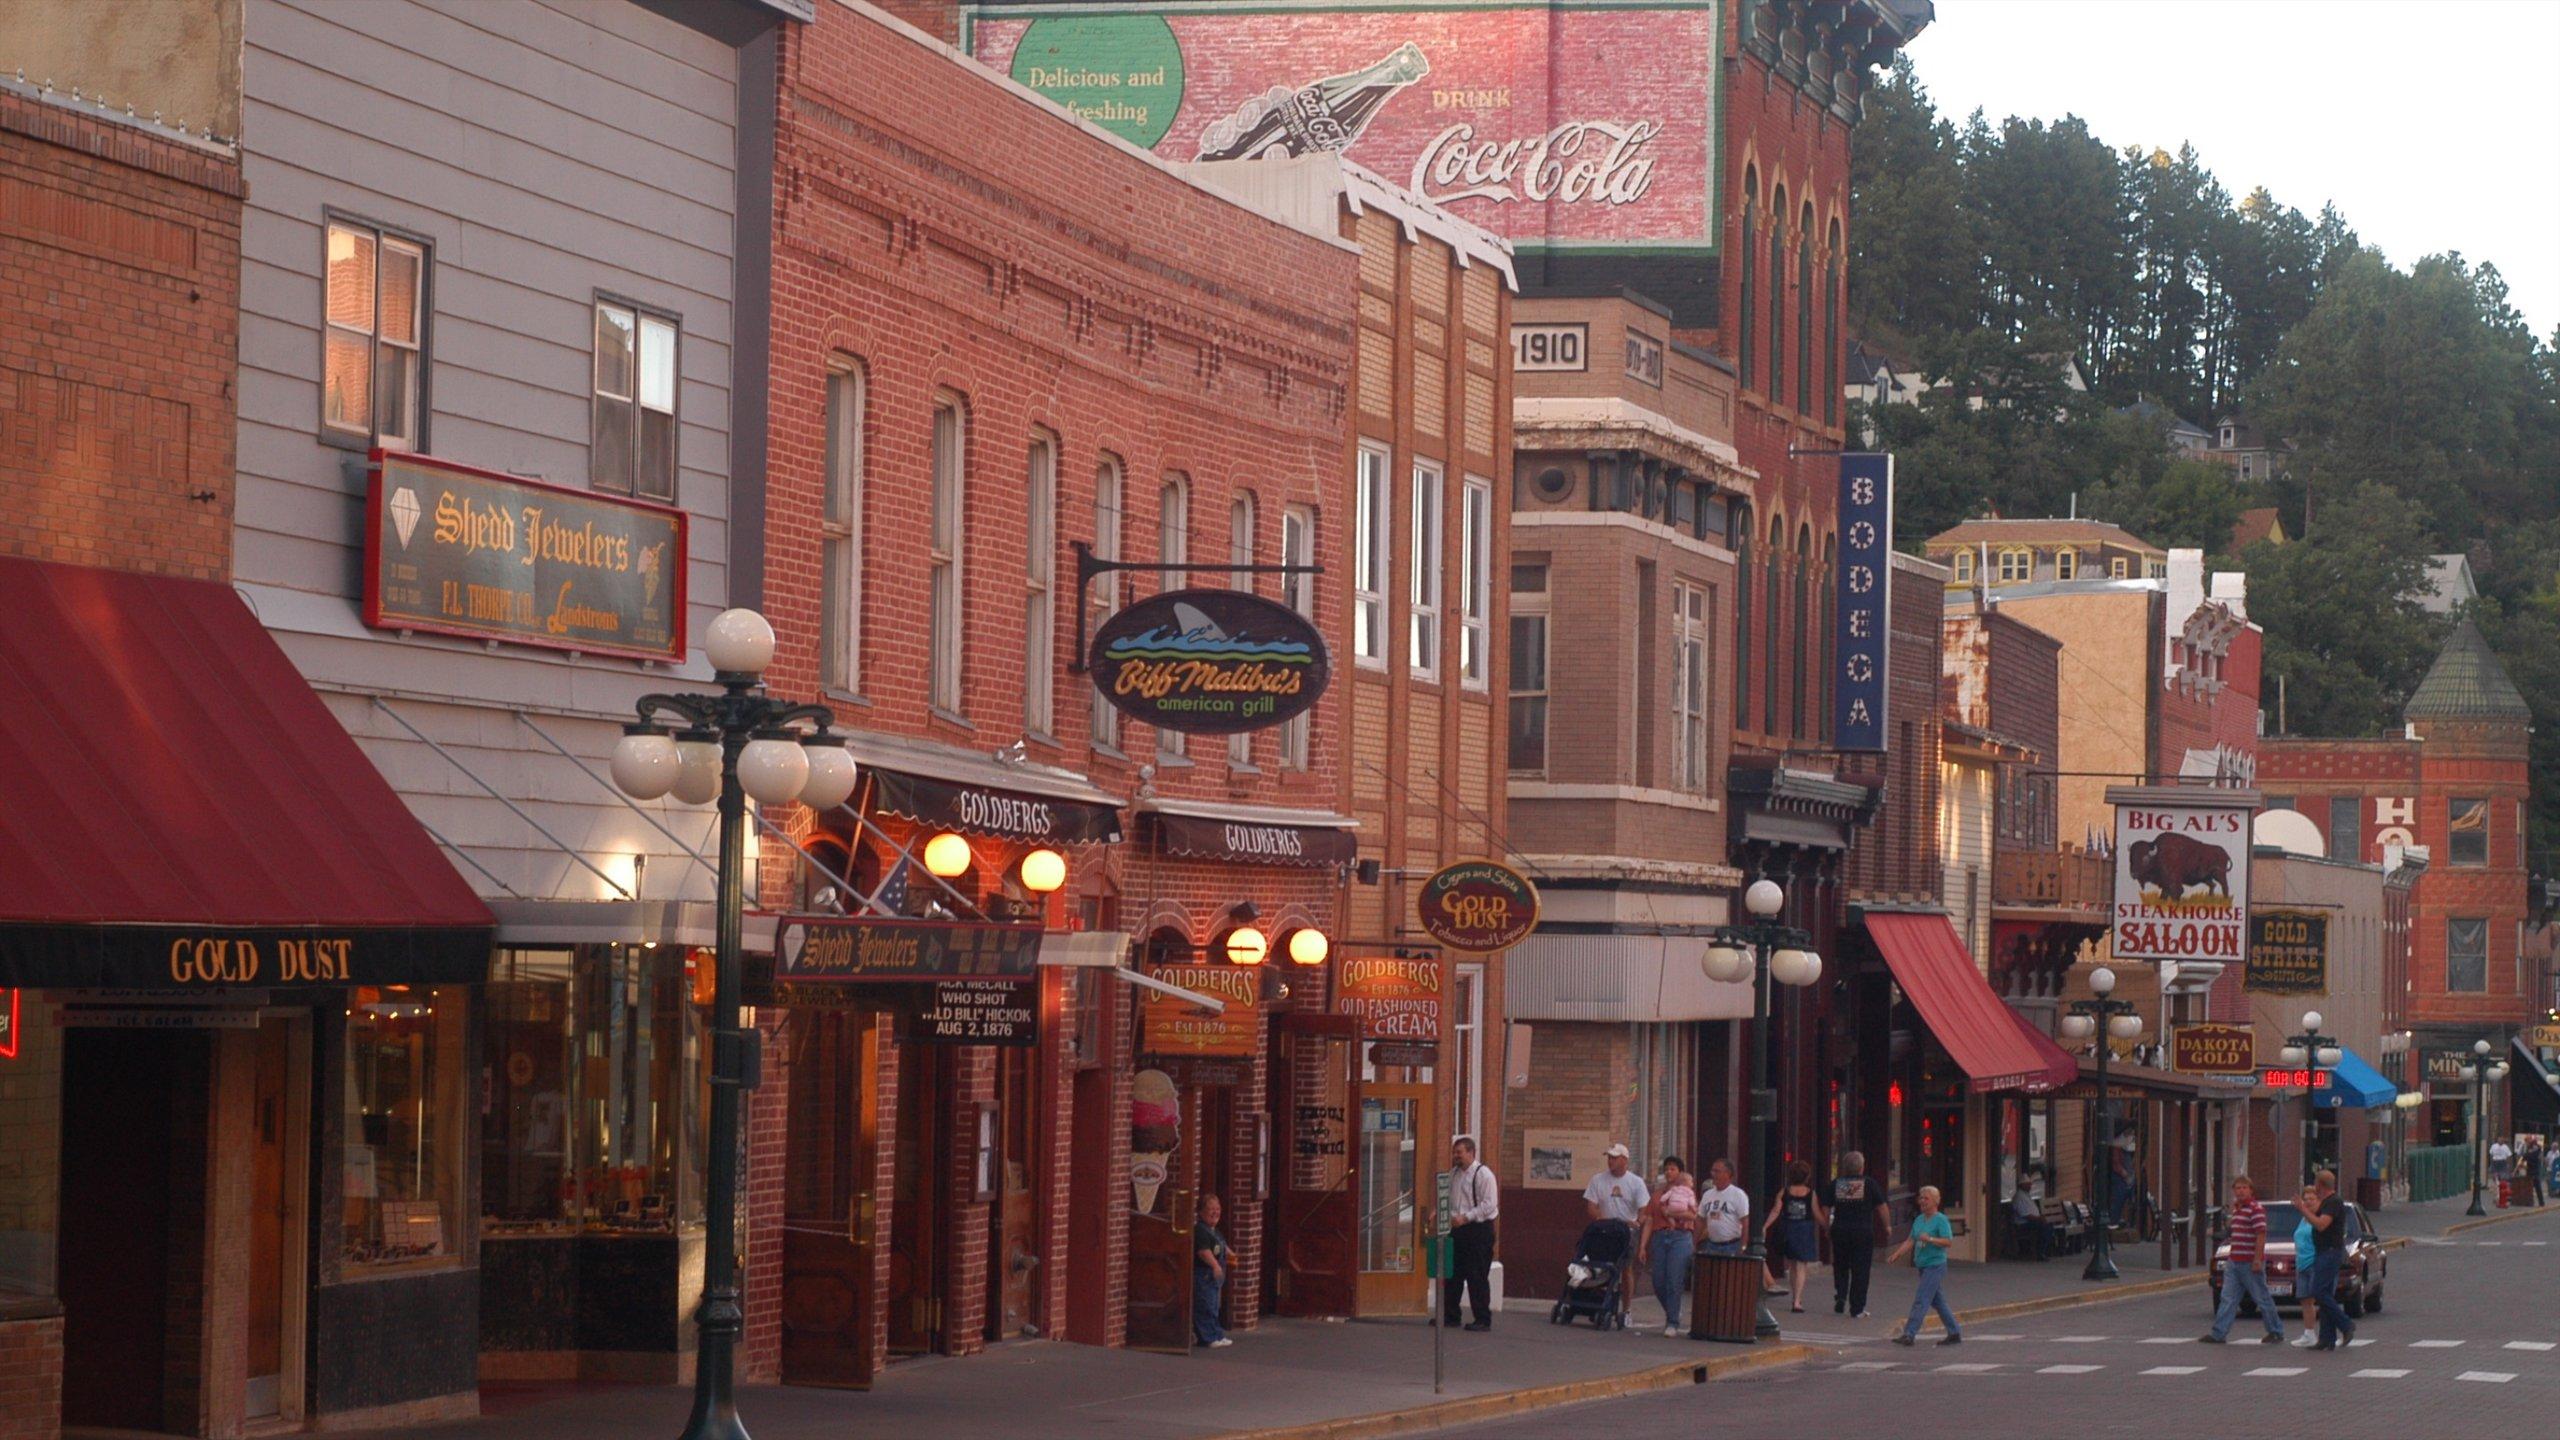 Lawrence County, South Dakota, United States of America